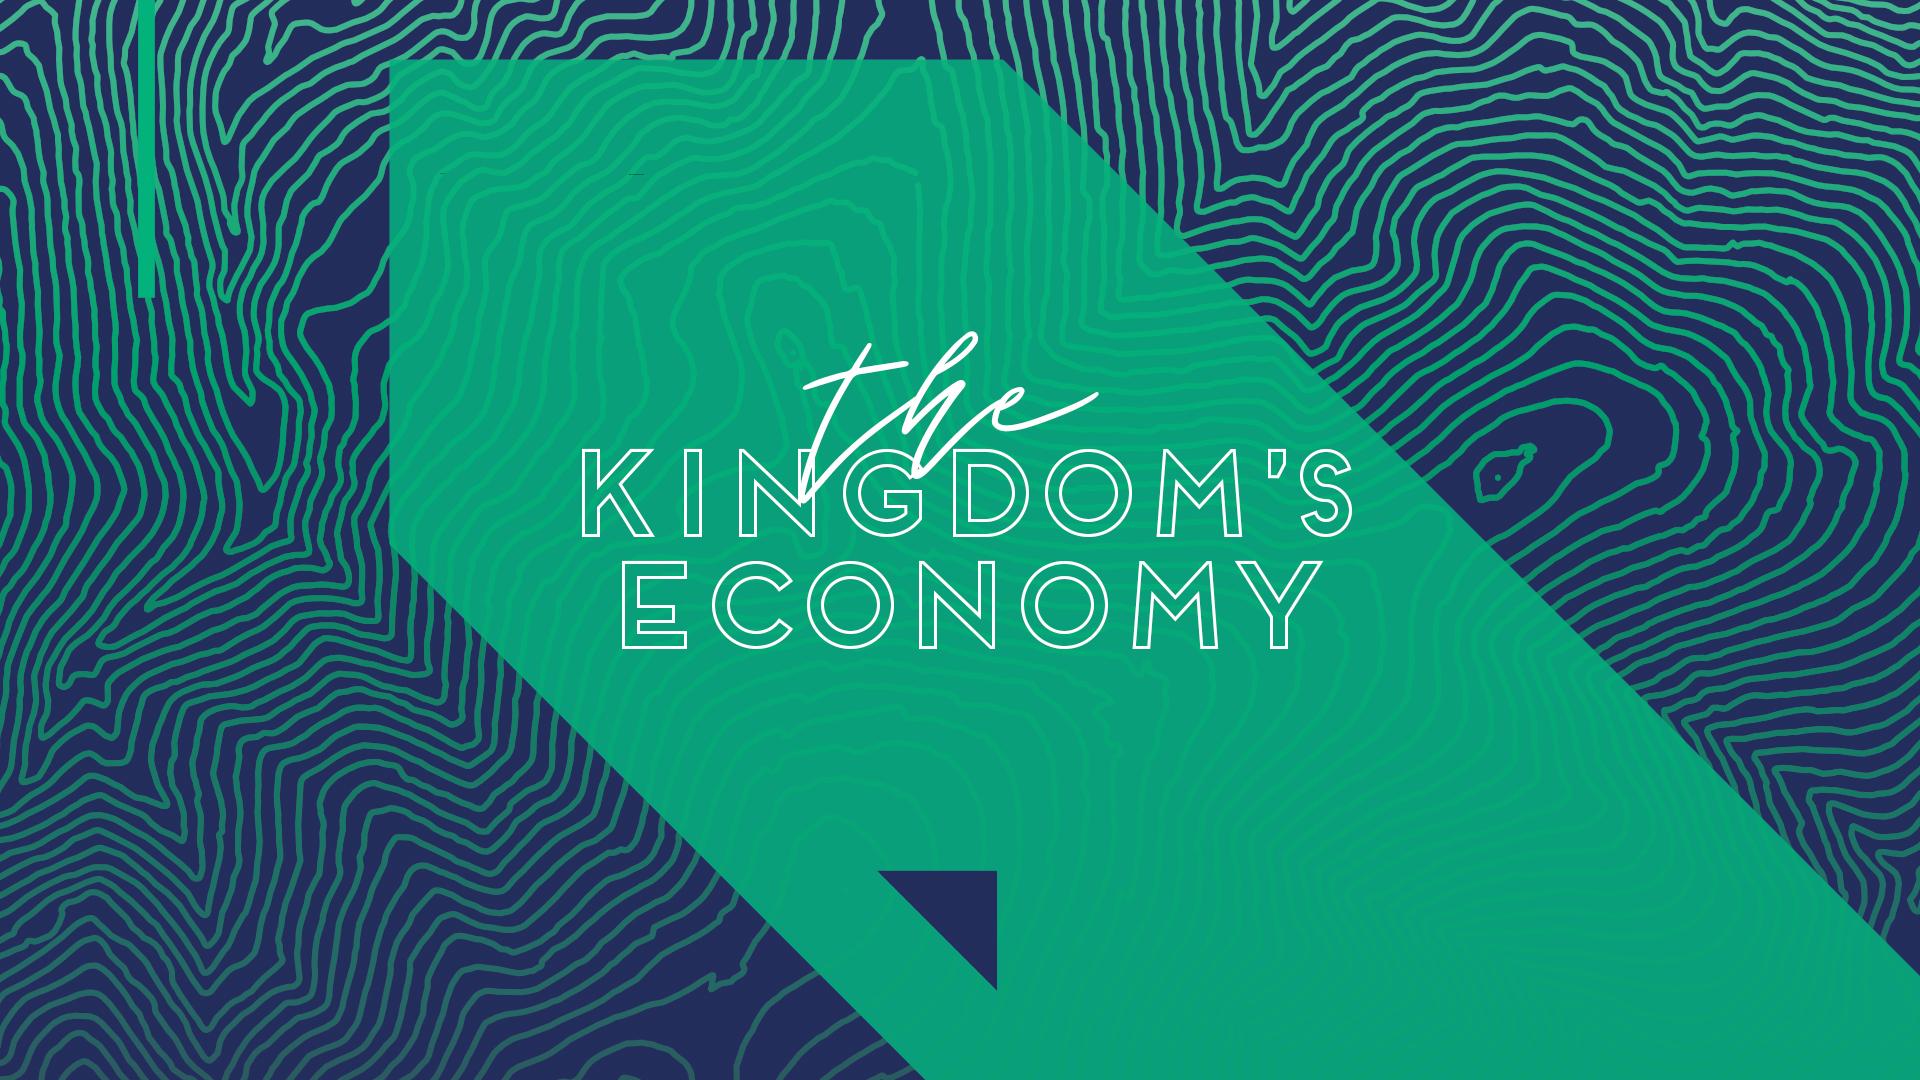 Kingdom's Economy.jpg